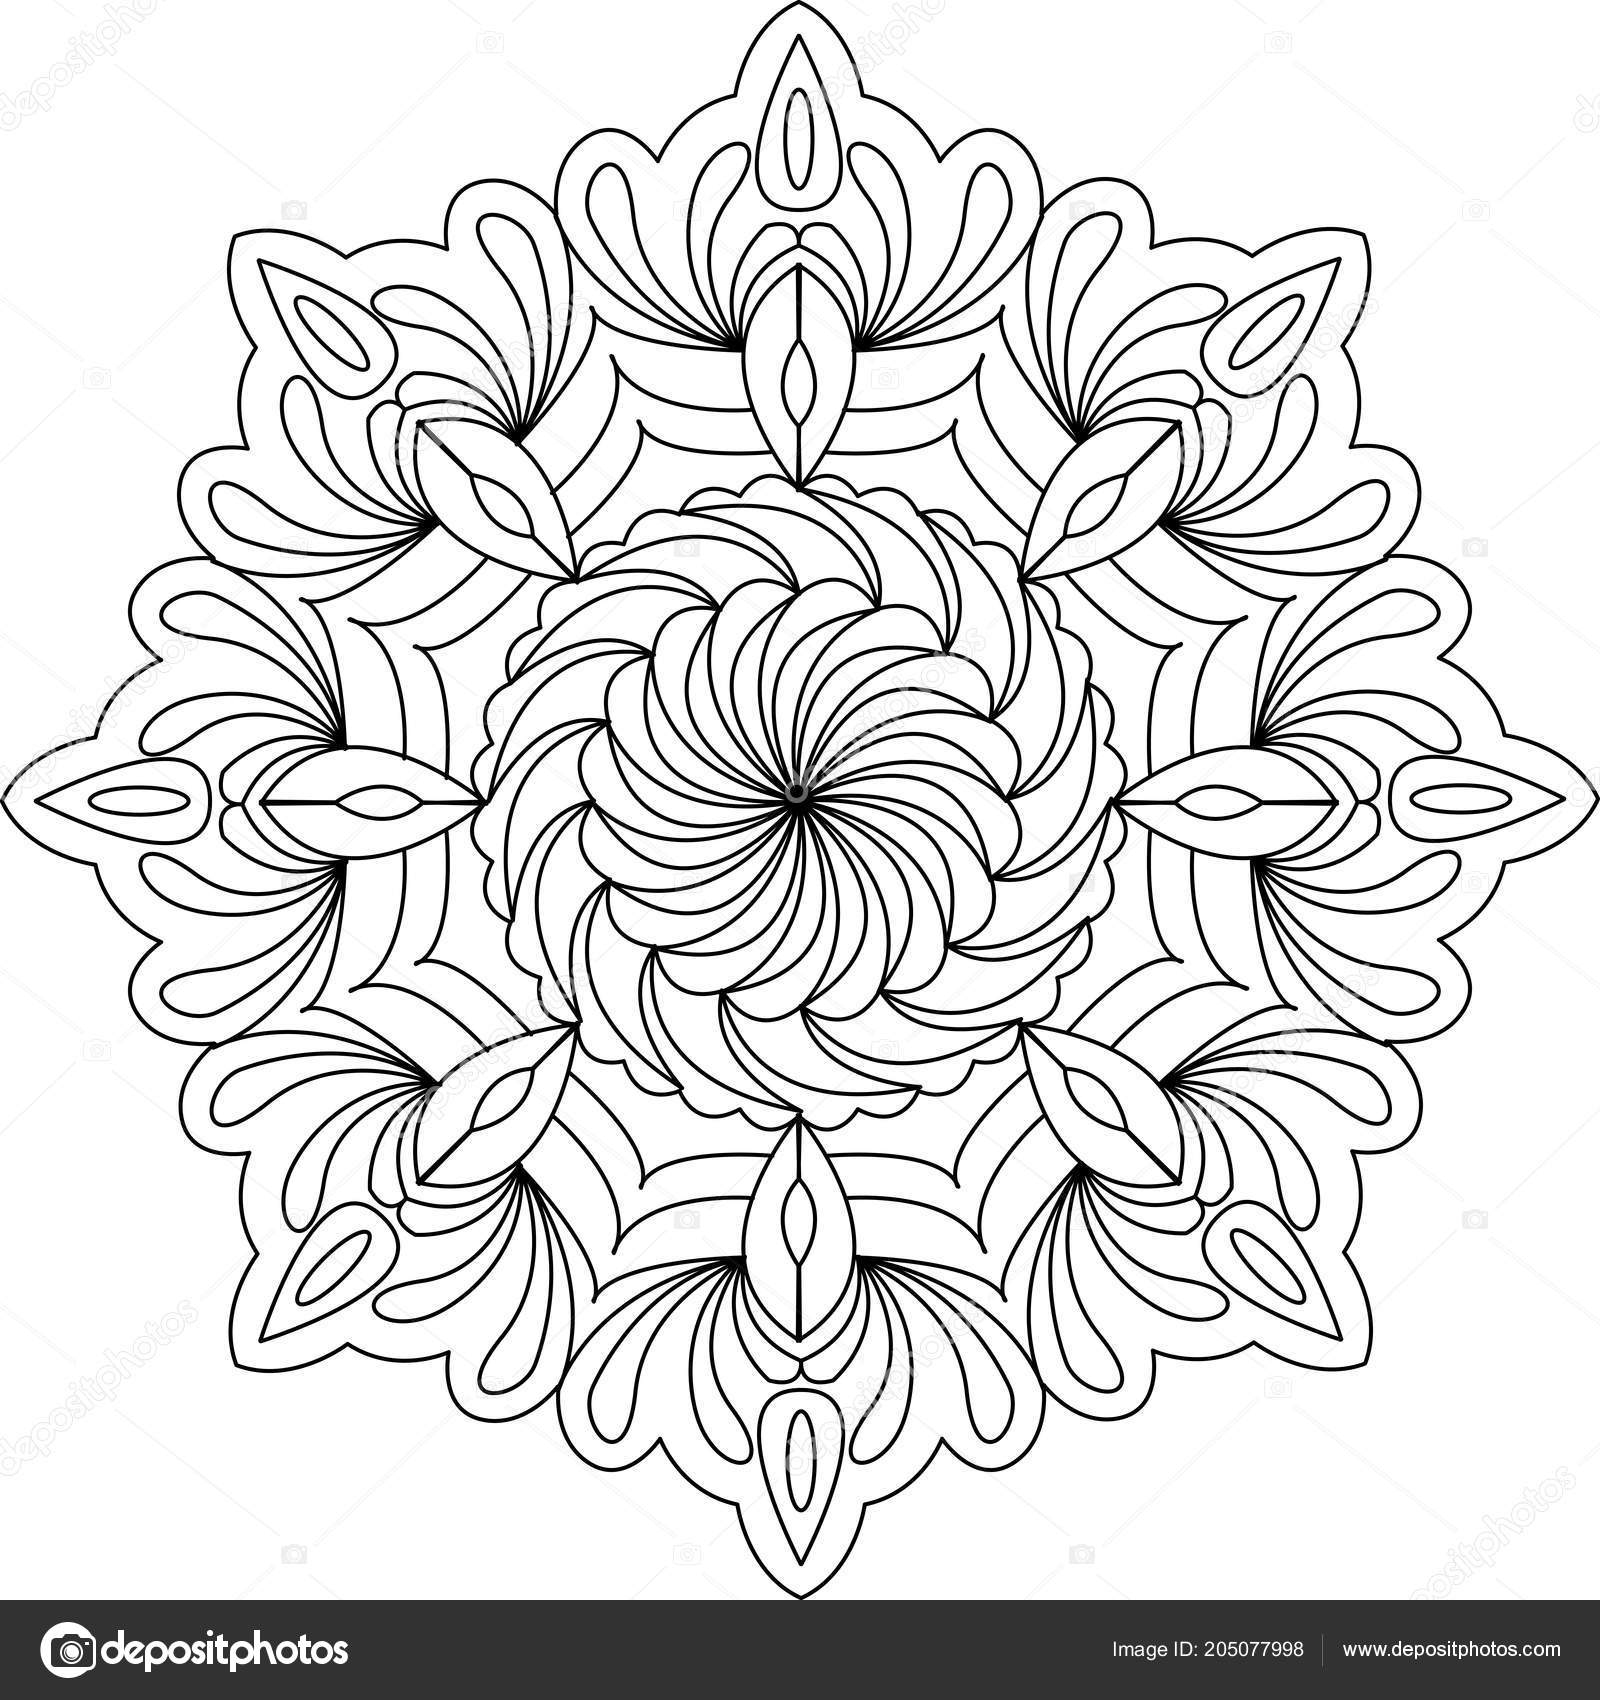 malvorlagen ornamente blumen  coloring and malvorlagan